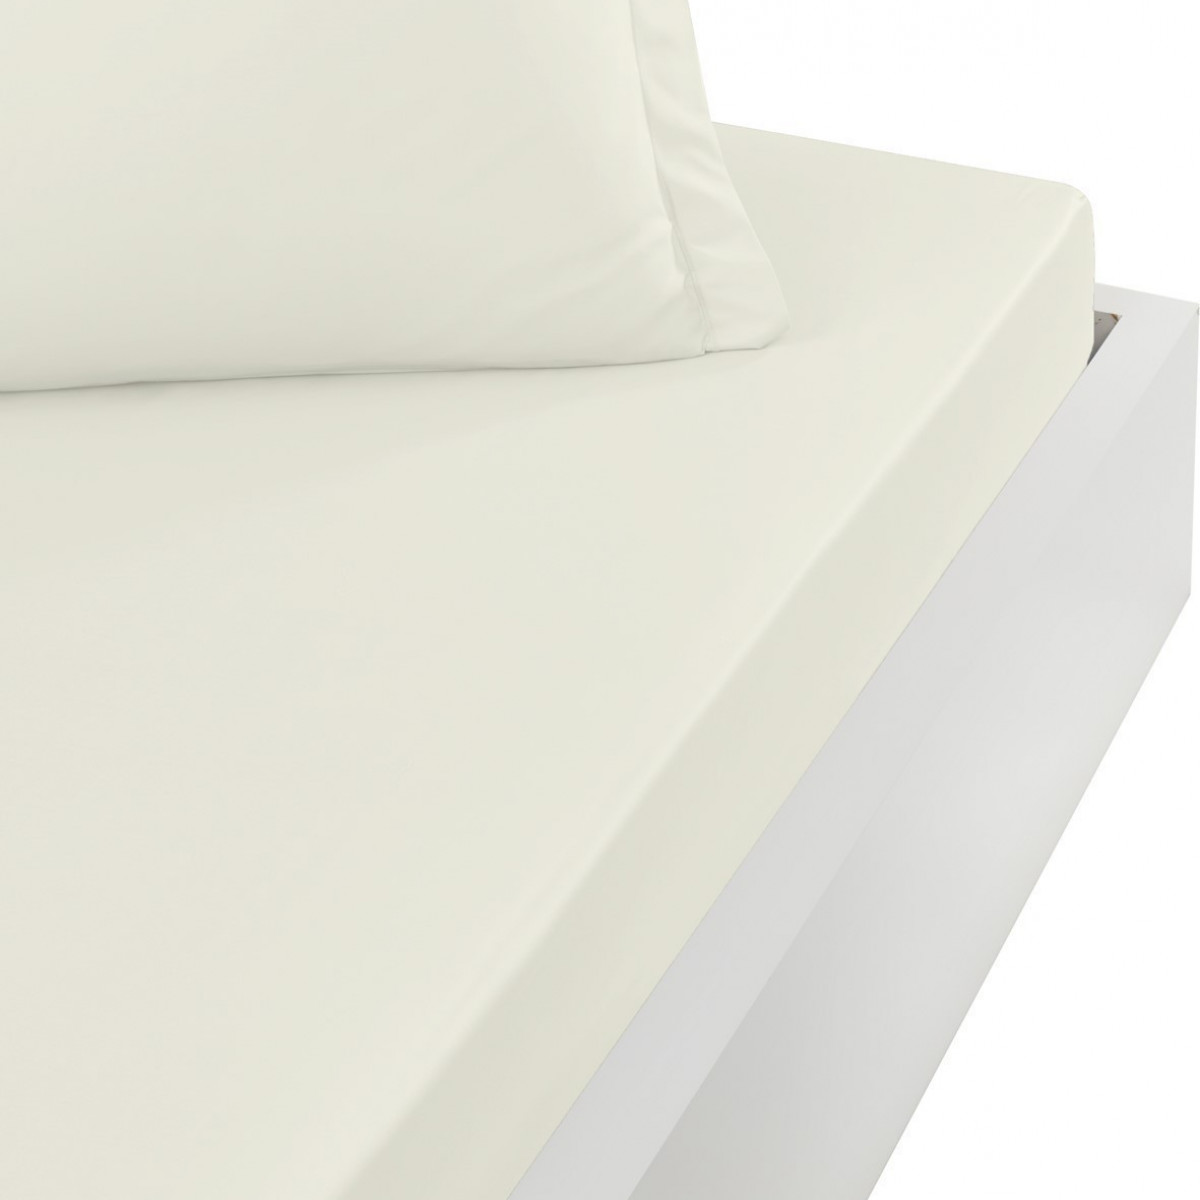 Drap housse en percale de coton bon Ecru 140x190 cm